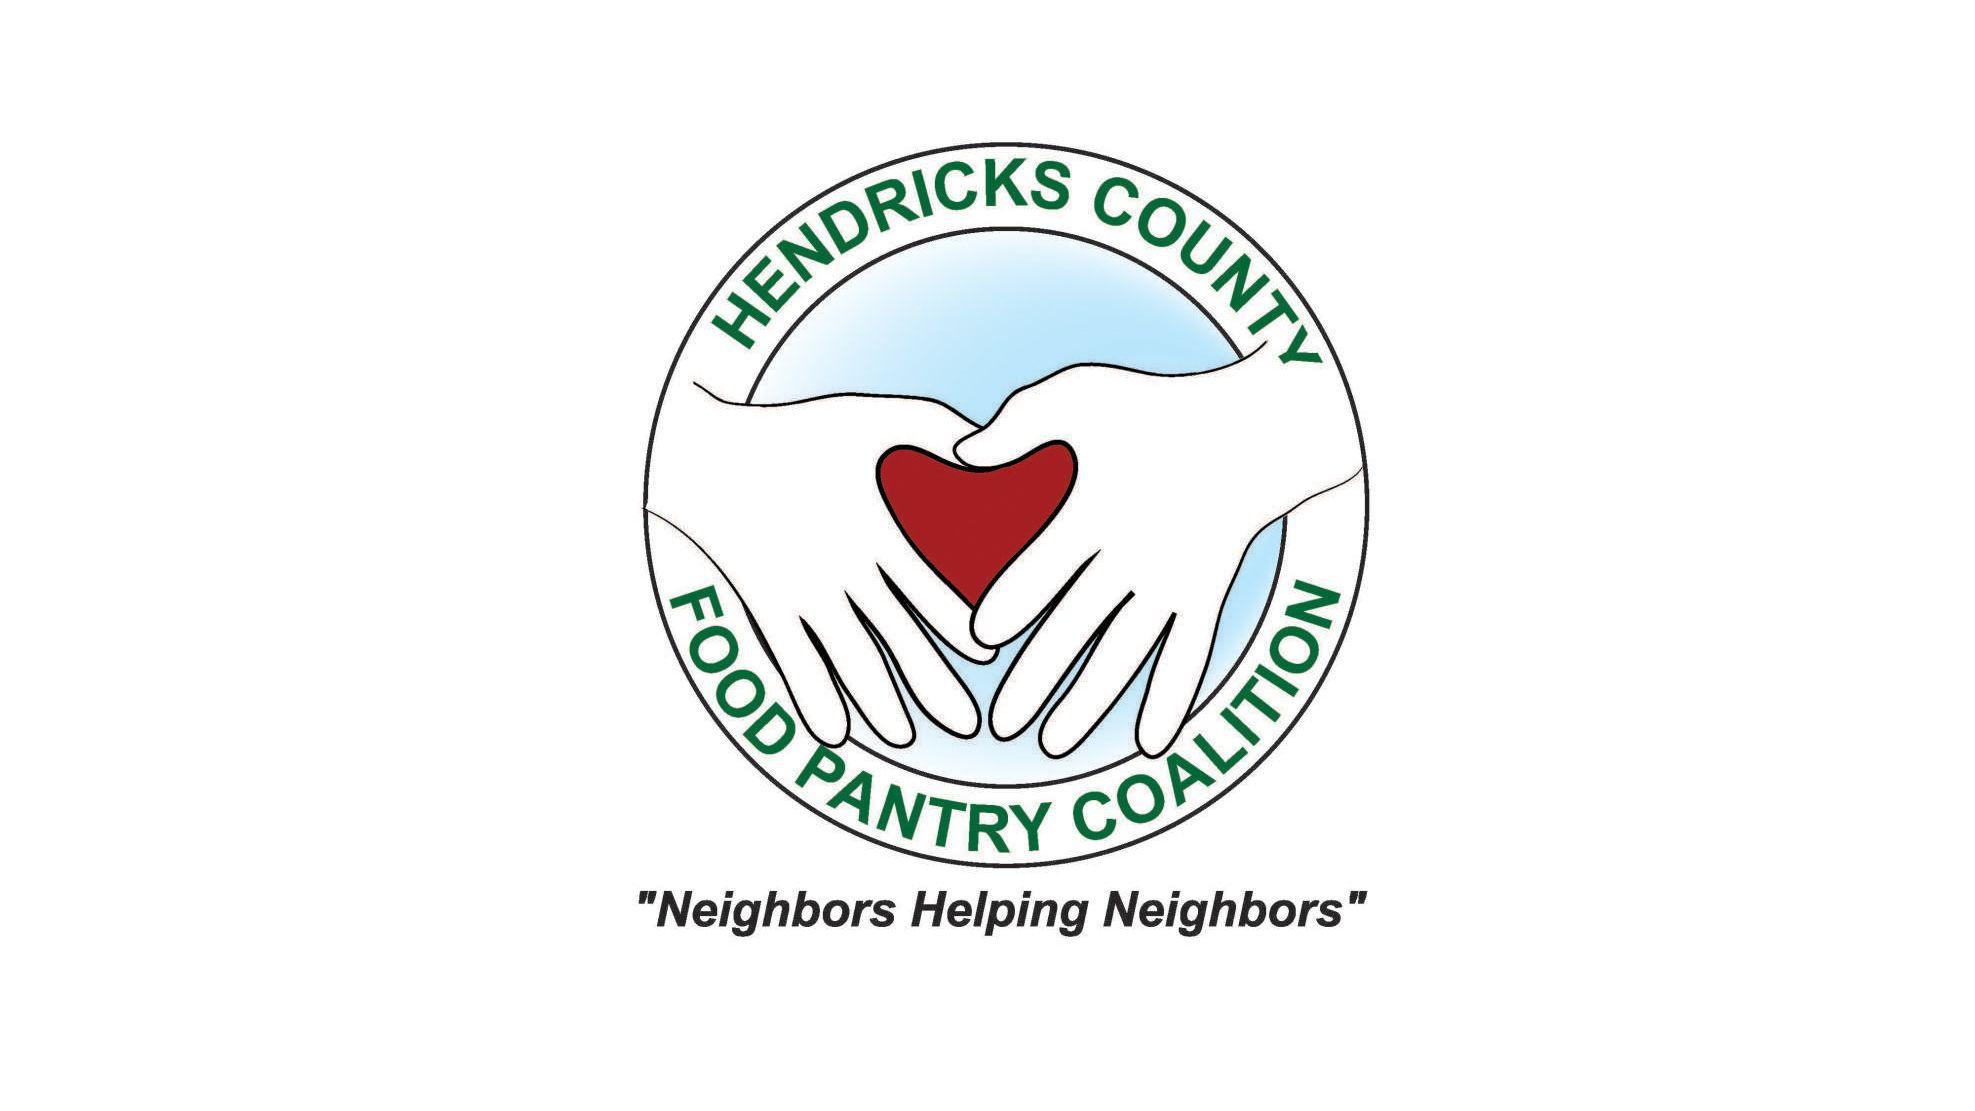 Hendricks County Food Pantry Coalition